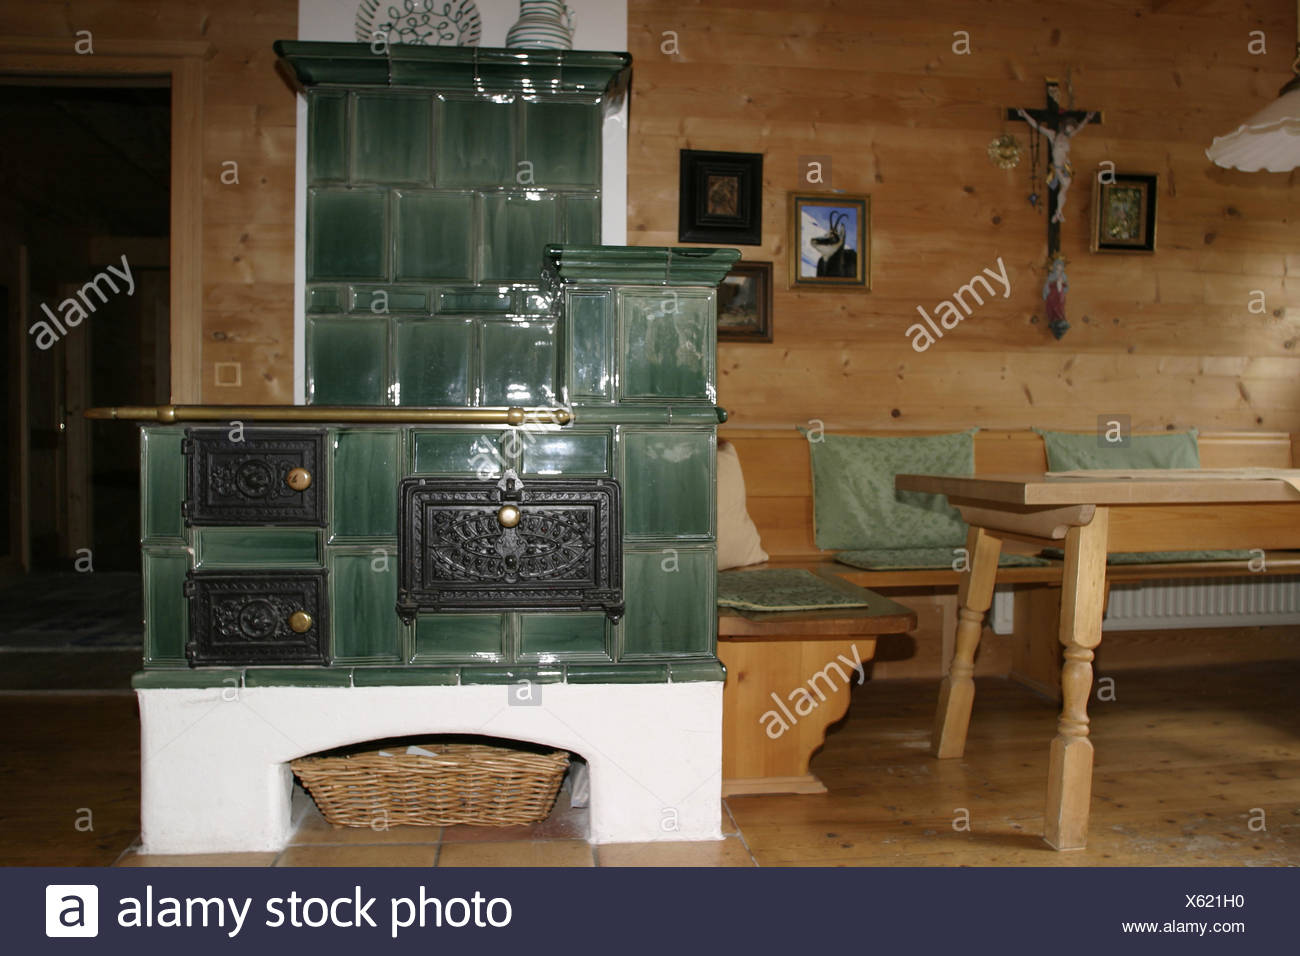 Sala residenziale stufa in maiolica camera salotto cucina